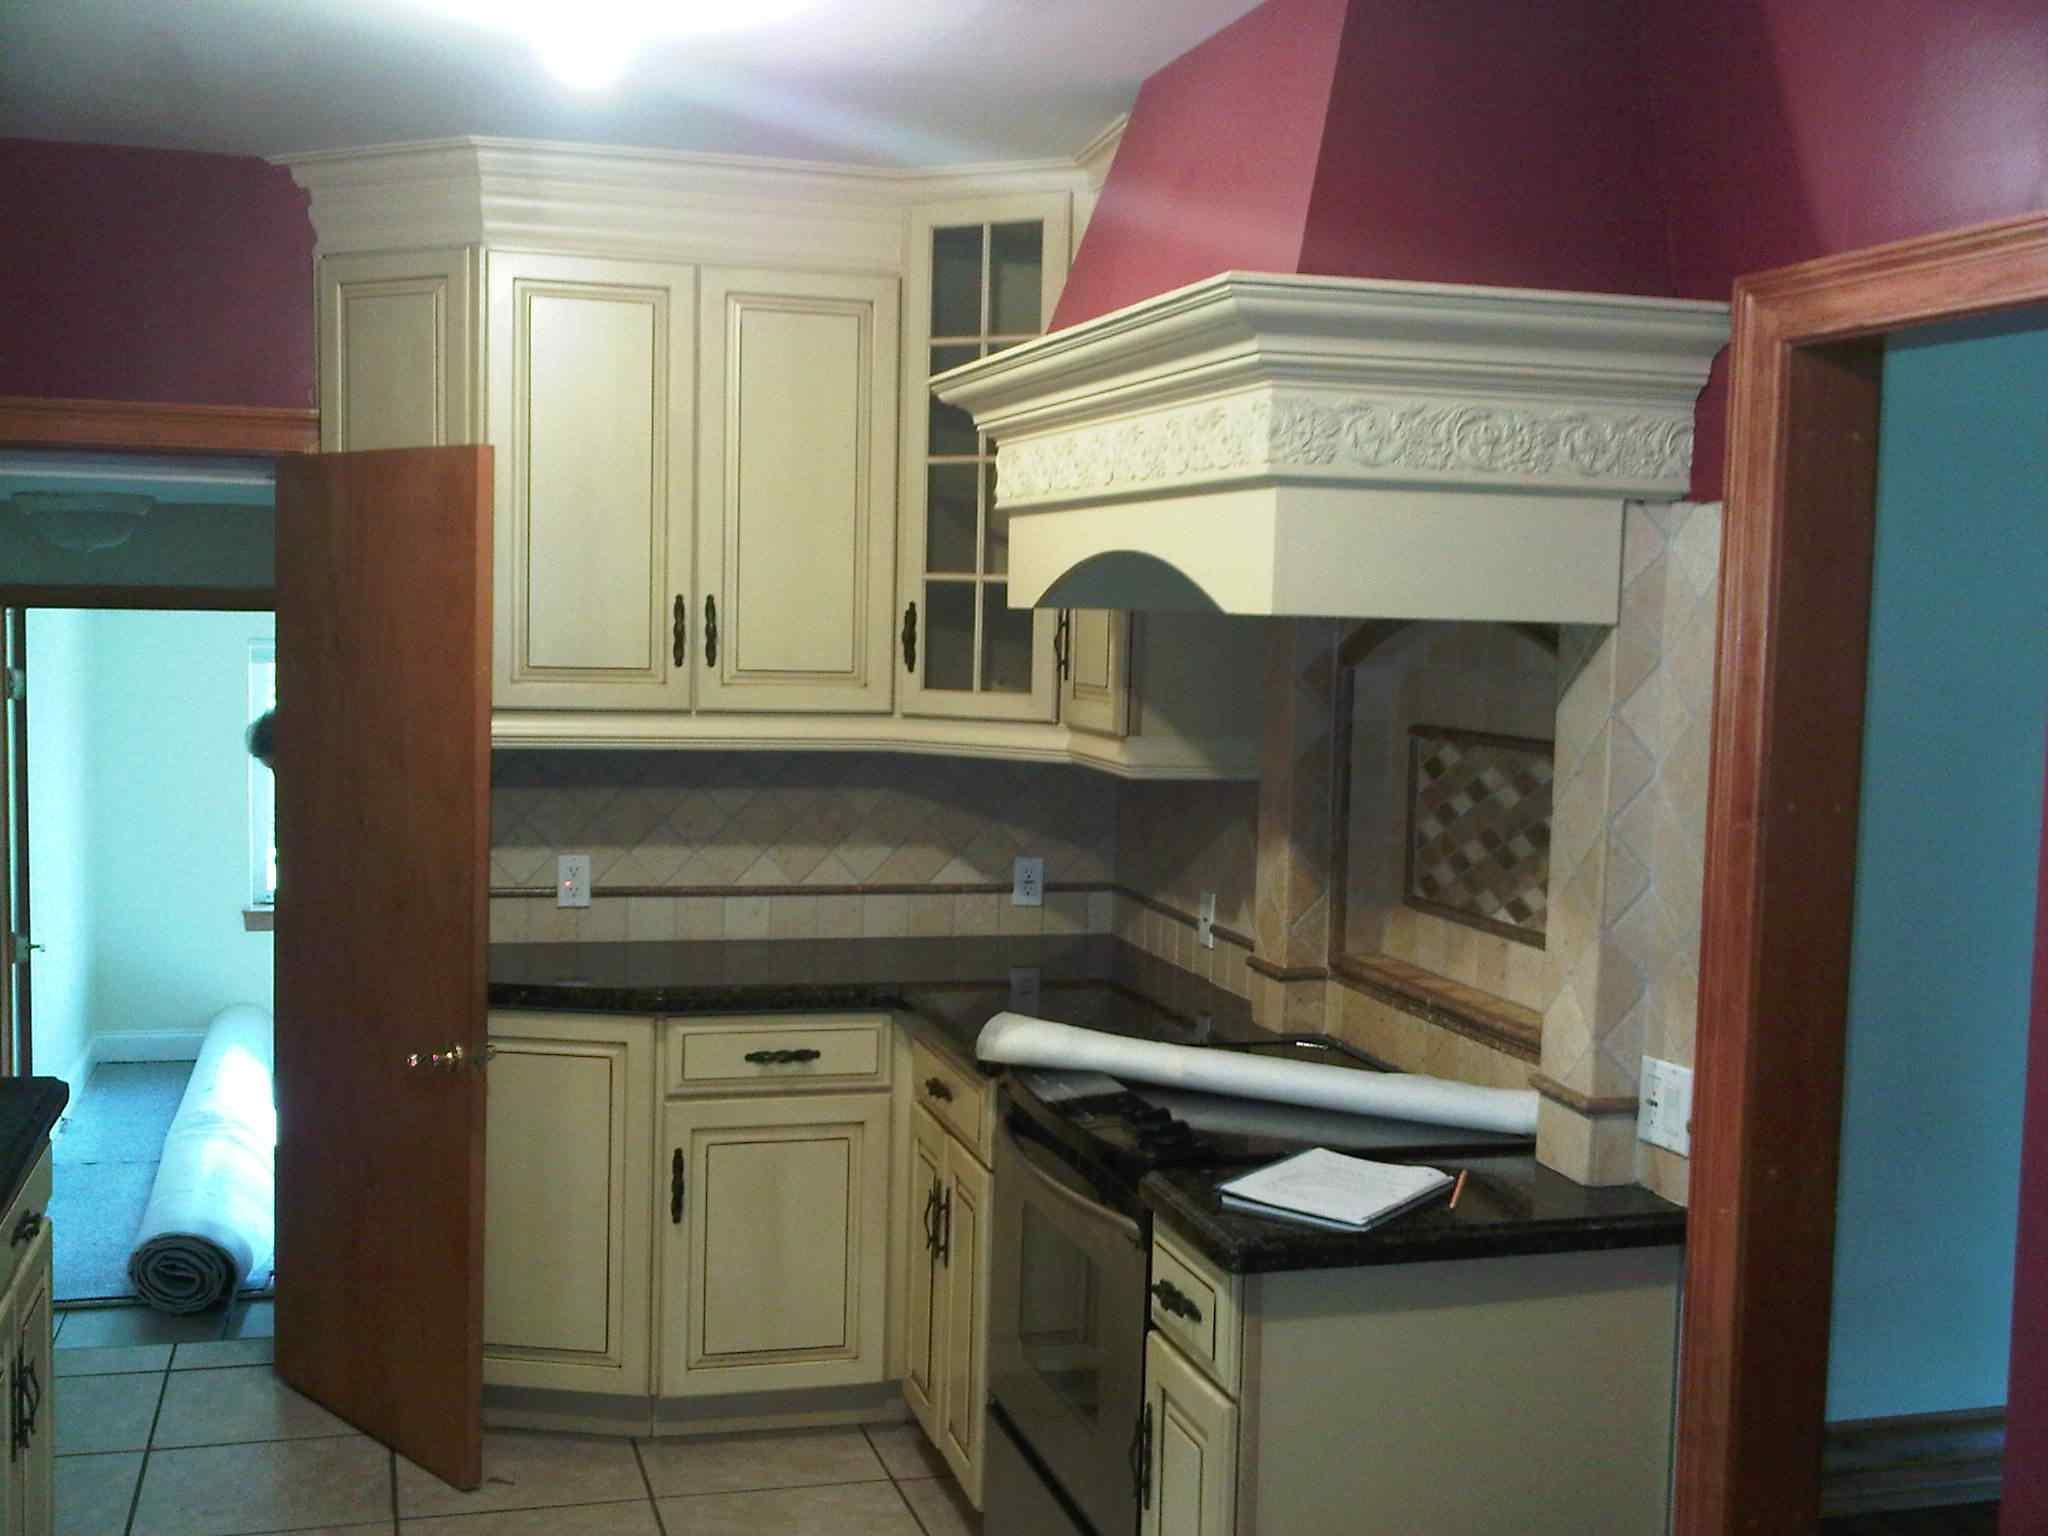 toni kitchen 1_1446035304_81455262